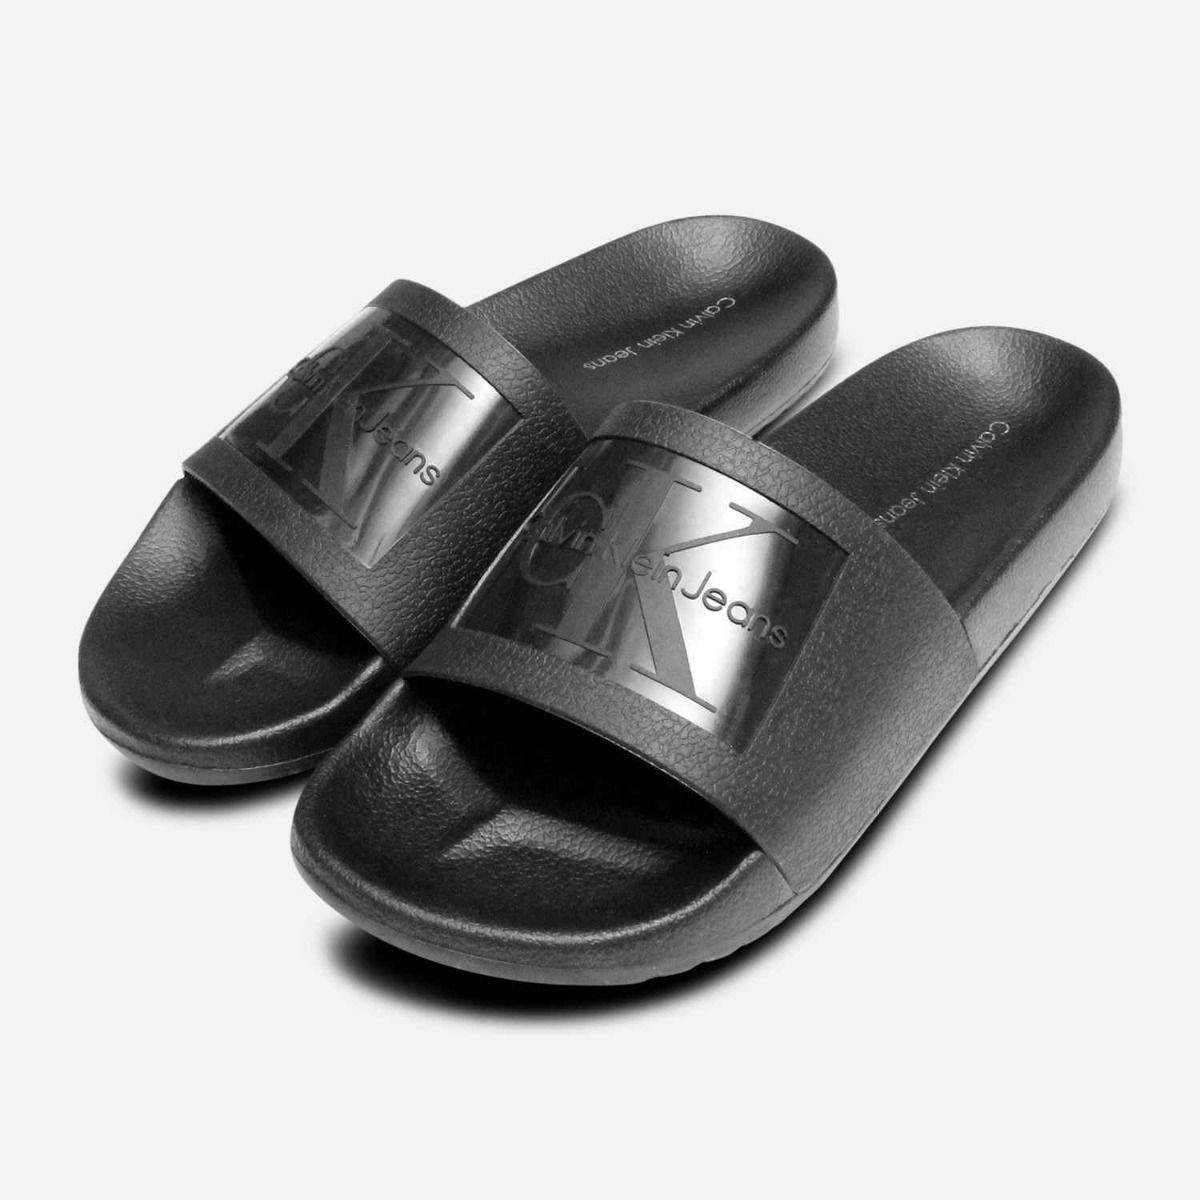 d94653d3393 Vincenzo Black Jelly Calvin Klein Mens Slide Sandals